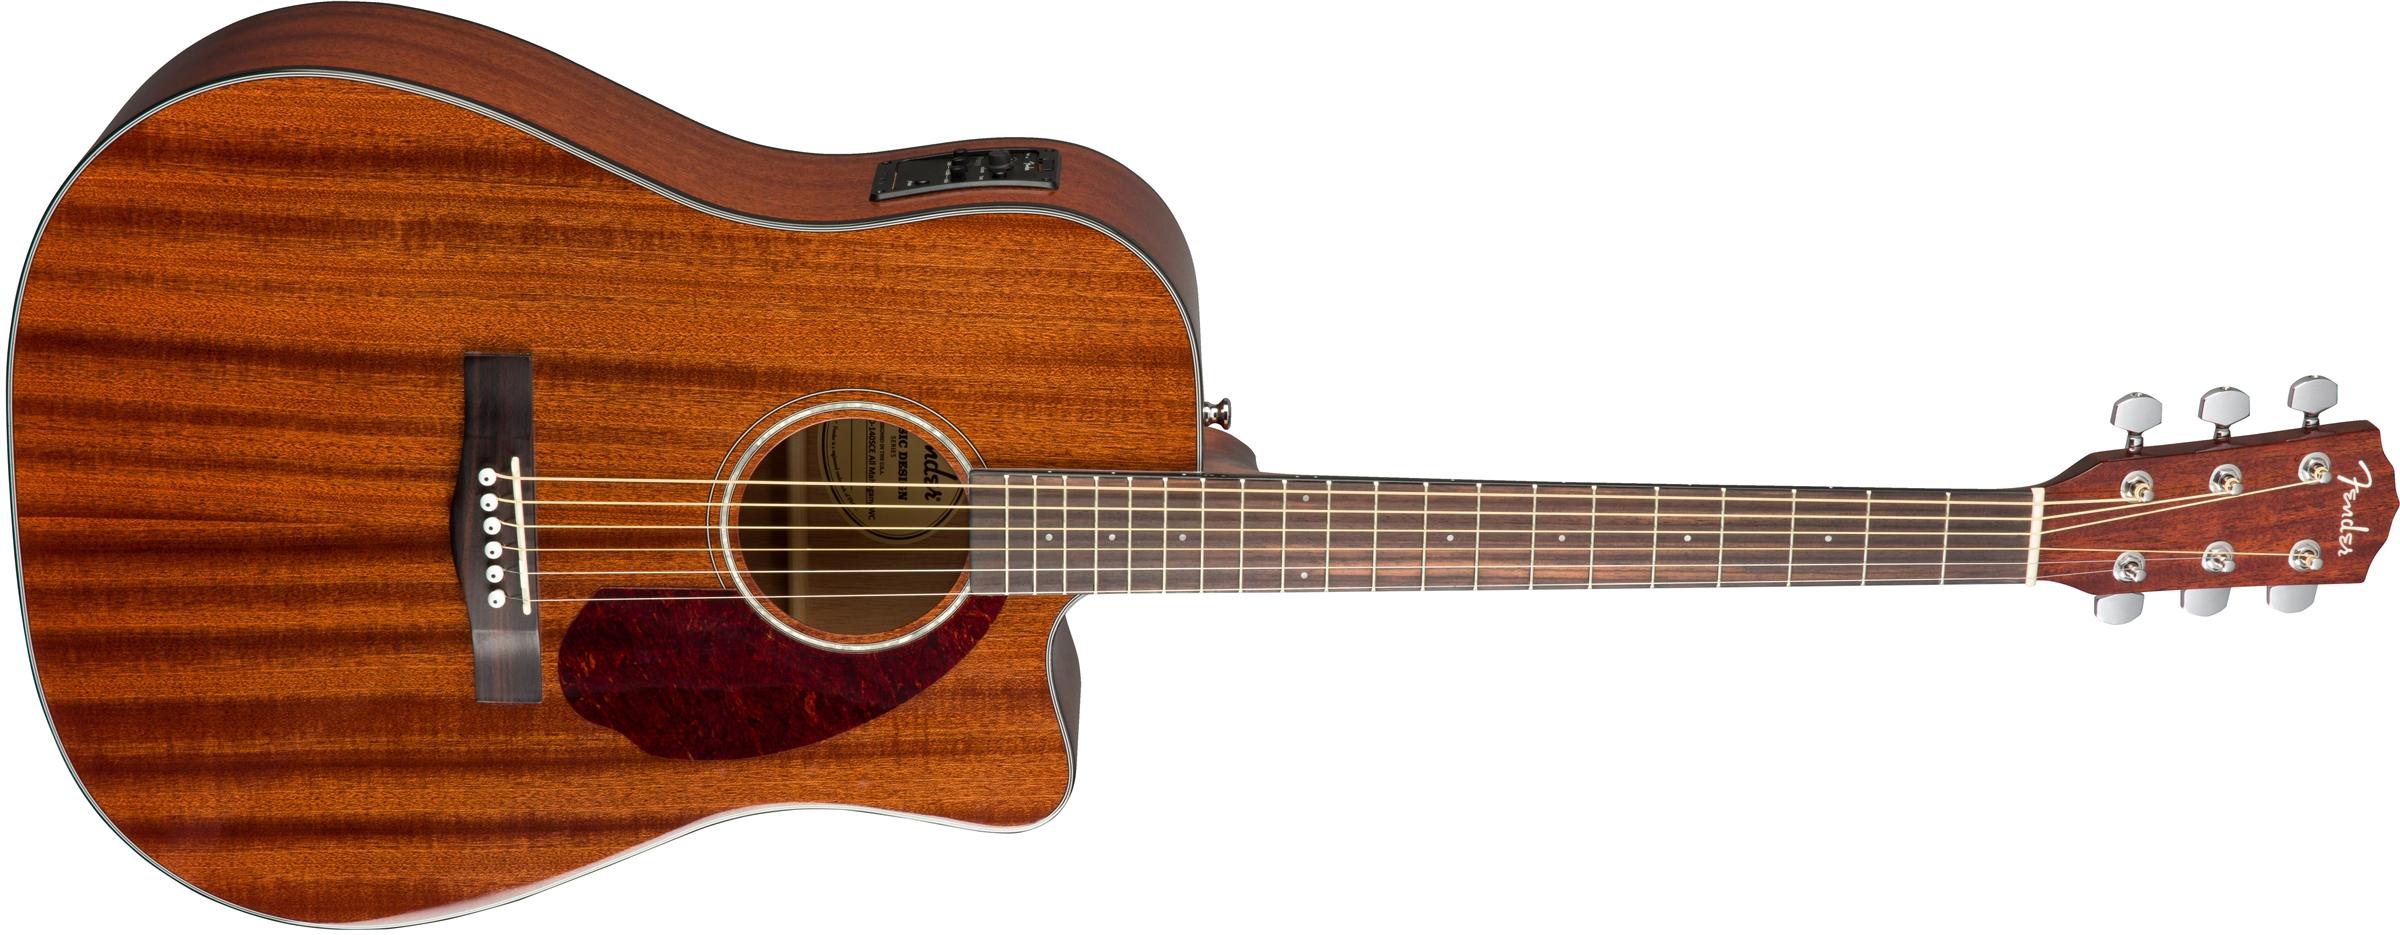 cd 140sce all mahogany acoustic guitars. Black Bedroom Furniture Sets. Home Design Ideas